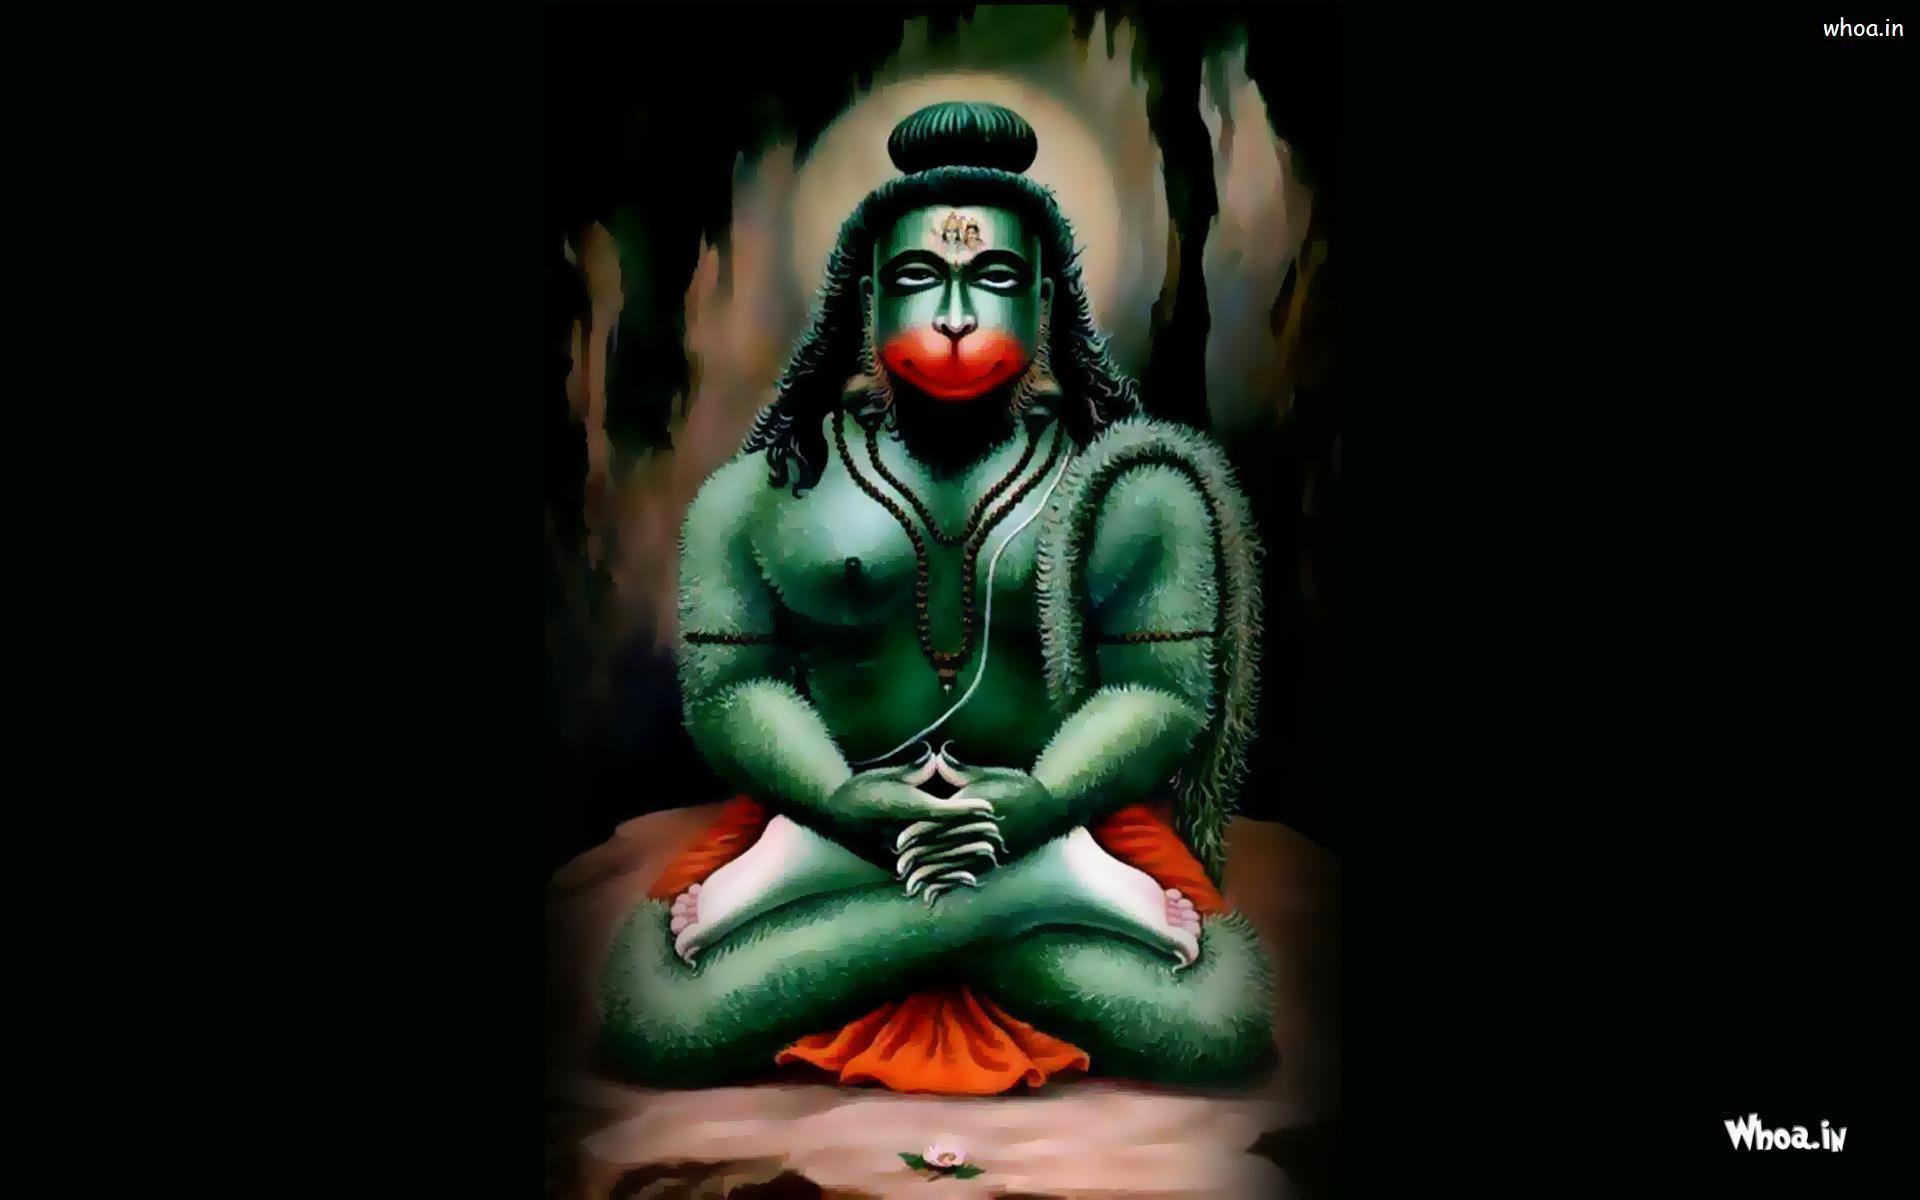 Hd wallpaper hanuman - Hd Wallpaper Hanuman 45